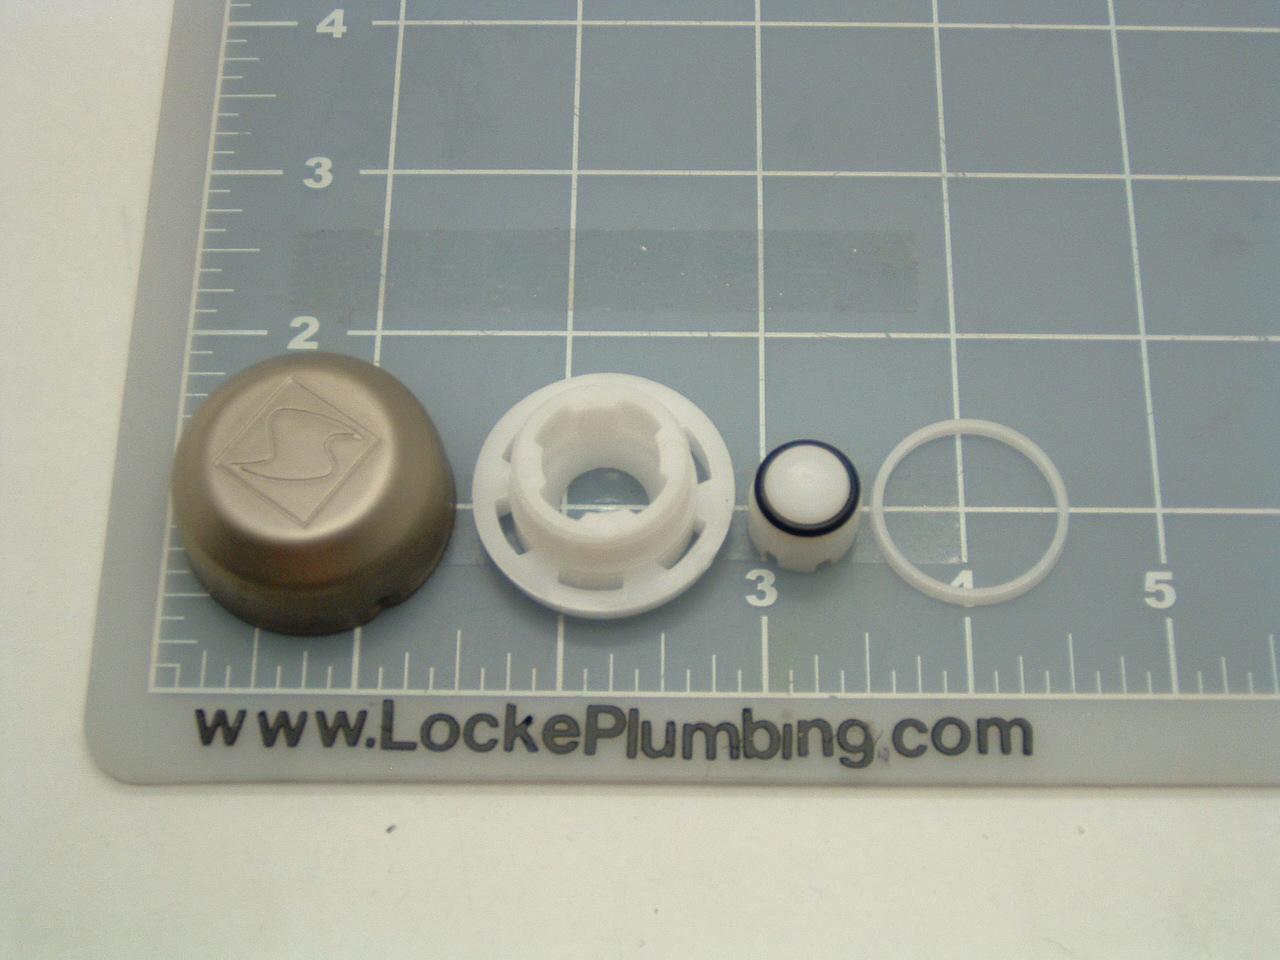 Jay R Smith Hprk 7vb Vacuum Breaker Repair Kit Locke